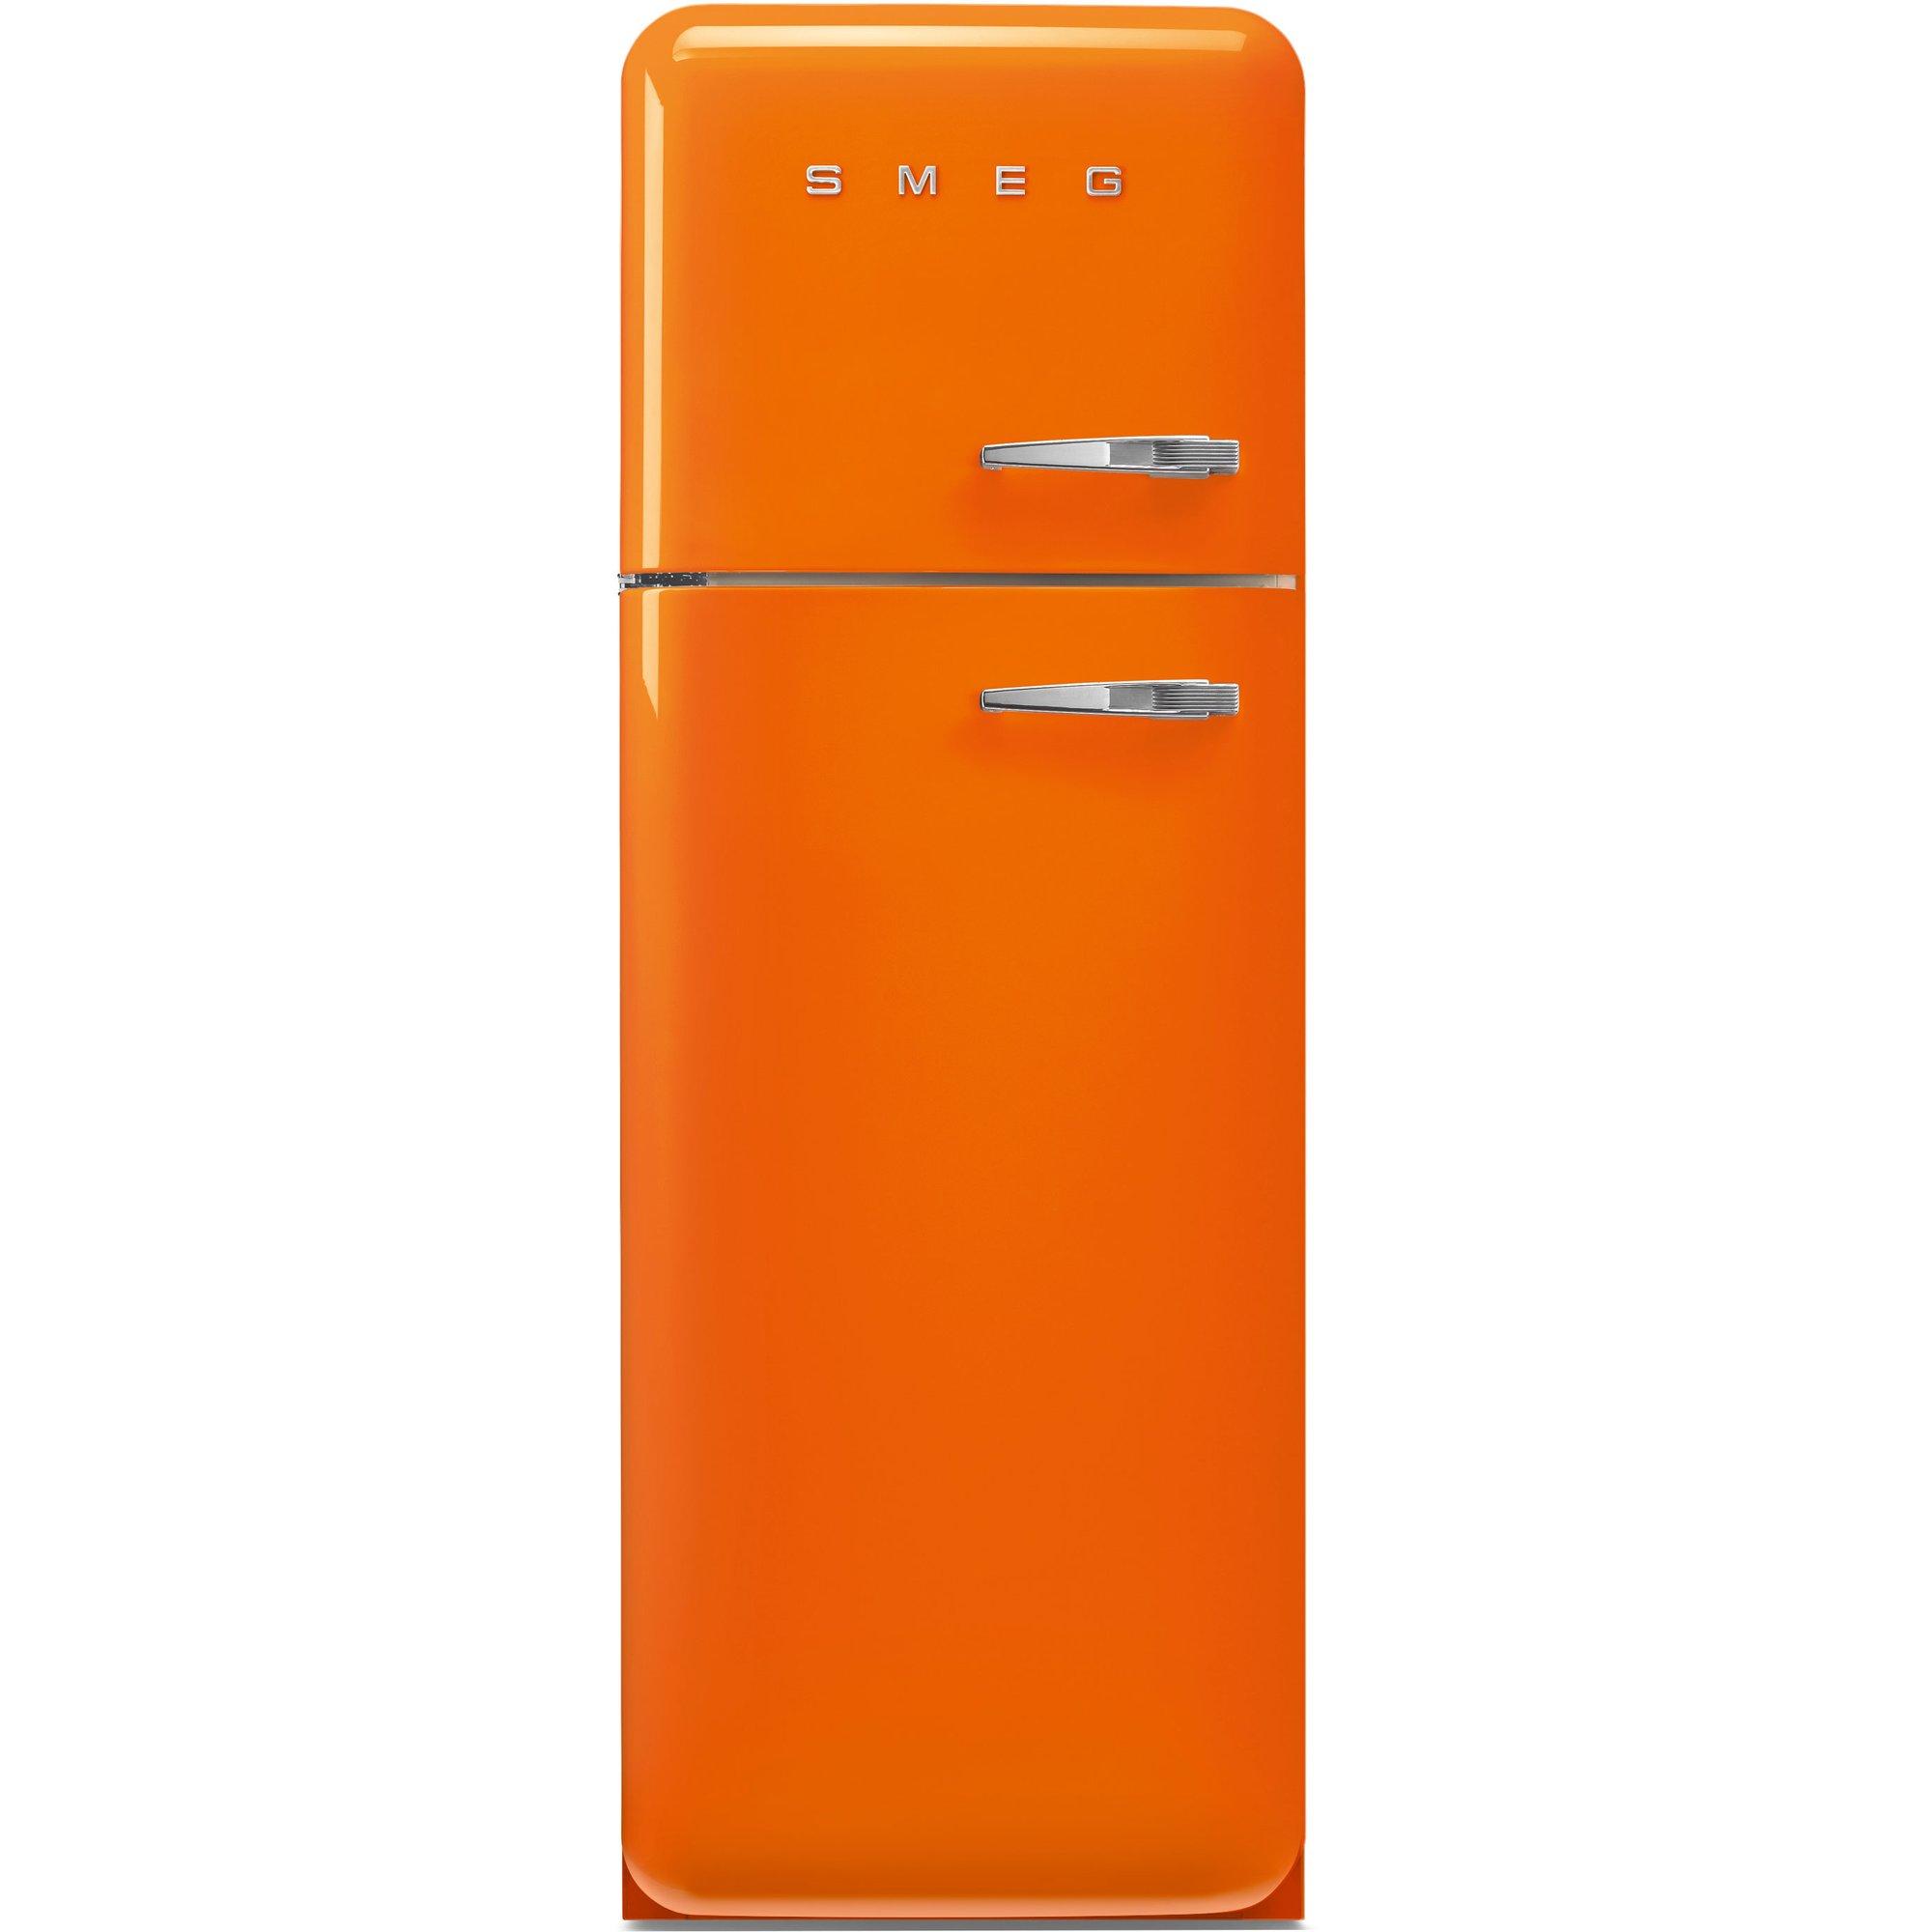 Smeg FAB30LOR5 Køle-/fryseskab orange